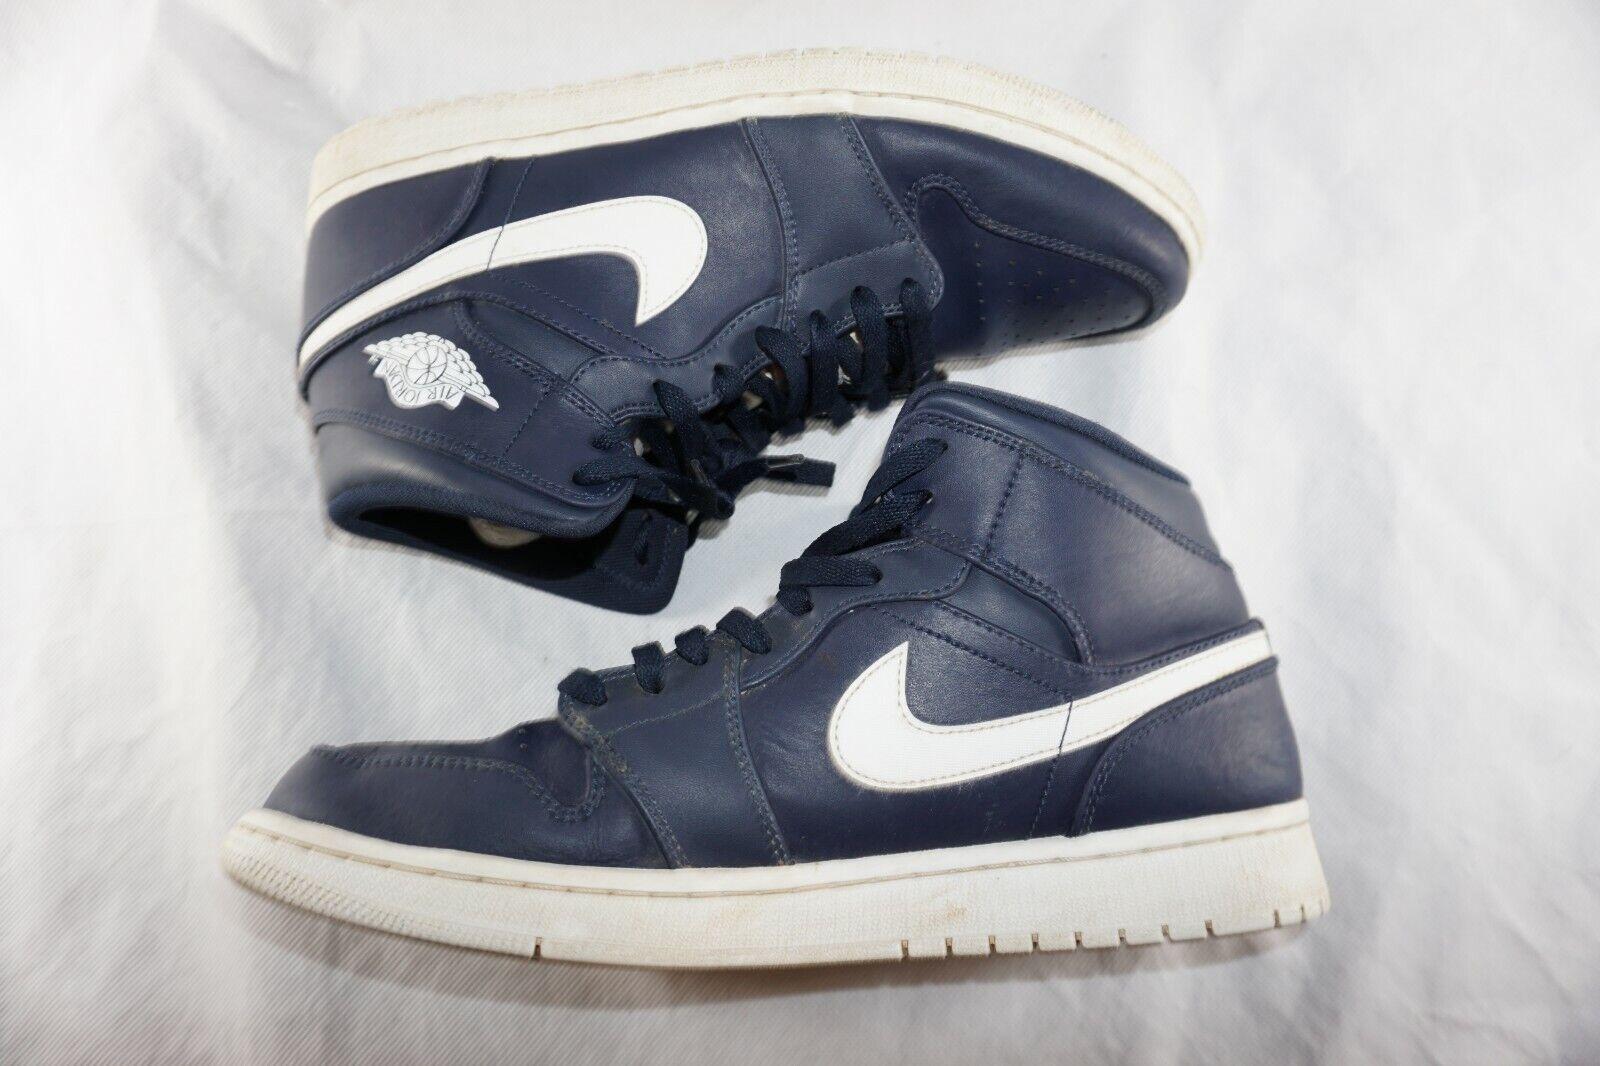 Nike Air Jordan Men's shoes 554724-402 Size 11 2017 used no box